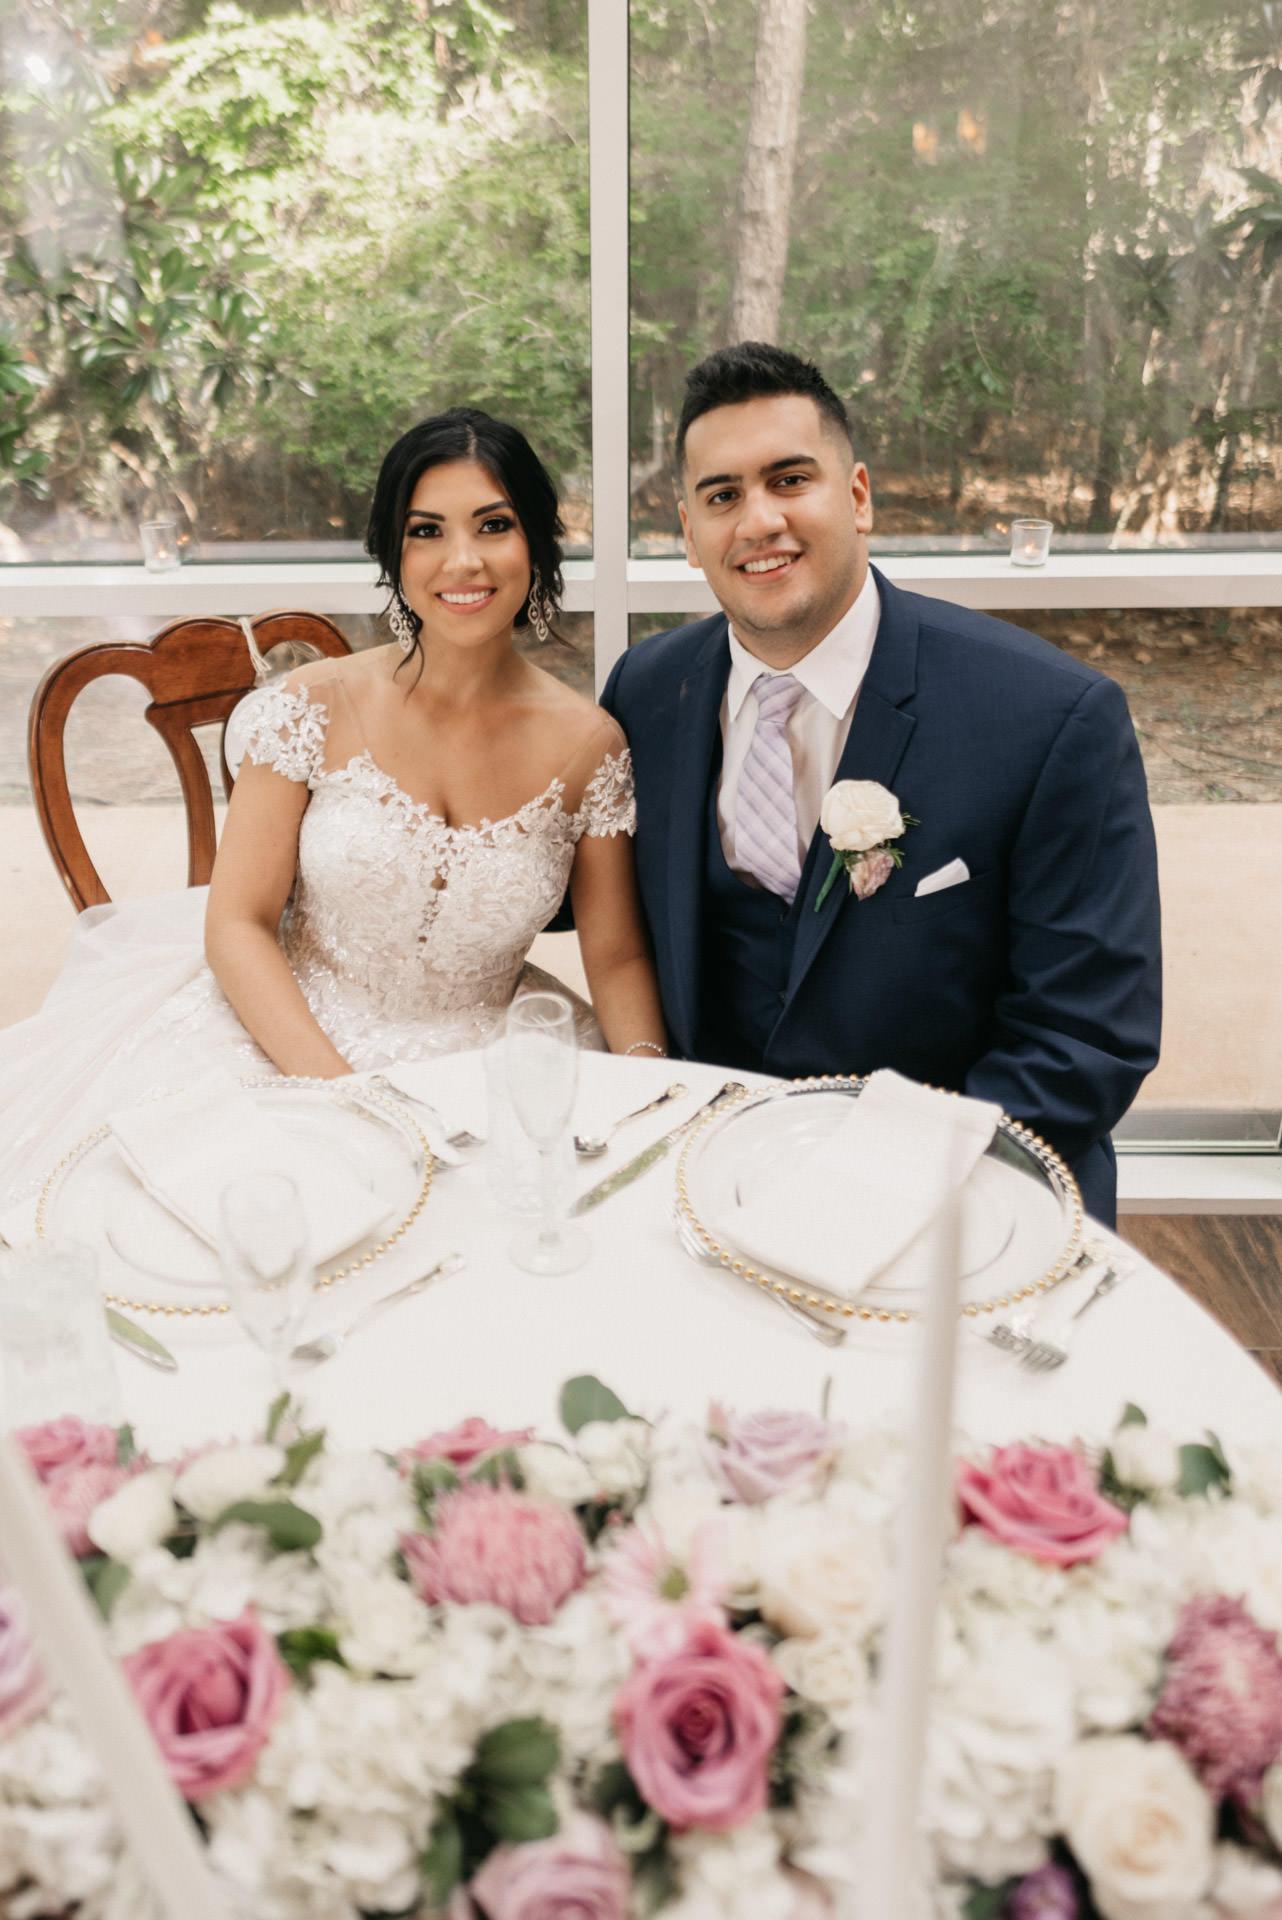 lexi-michael-wedding-blog-sm-86.jpg